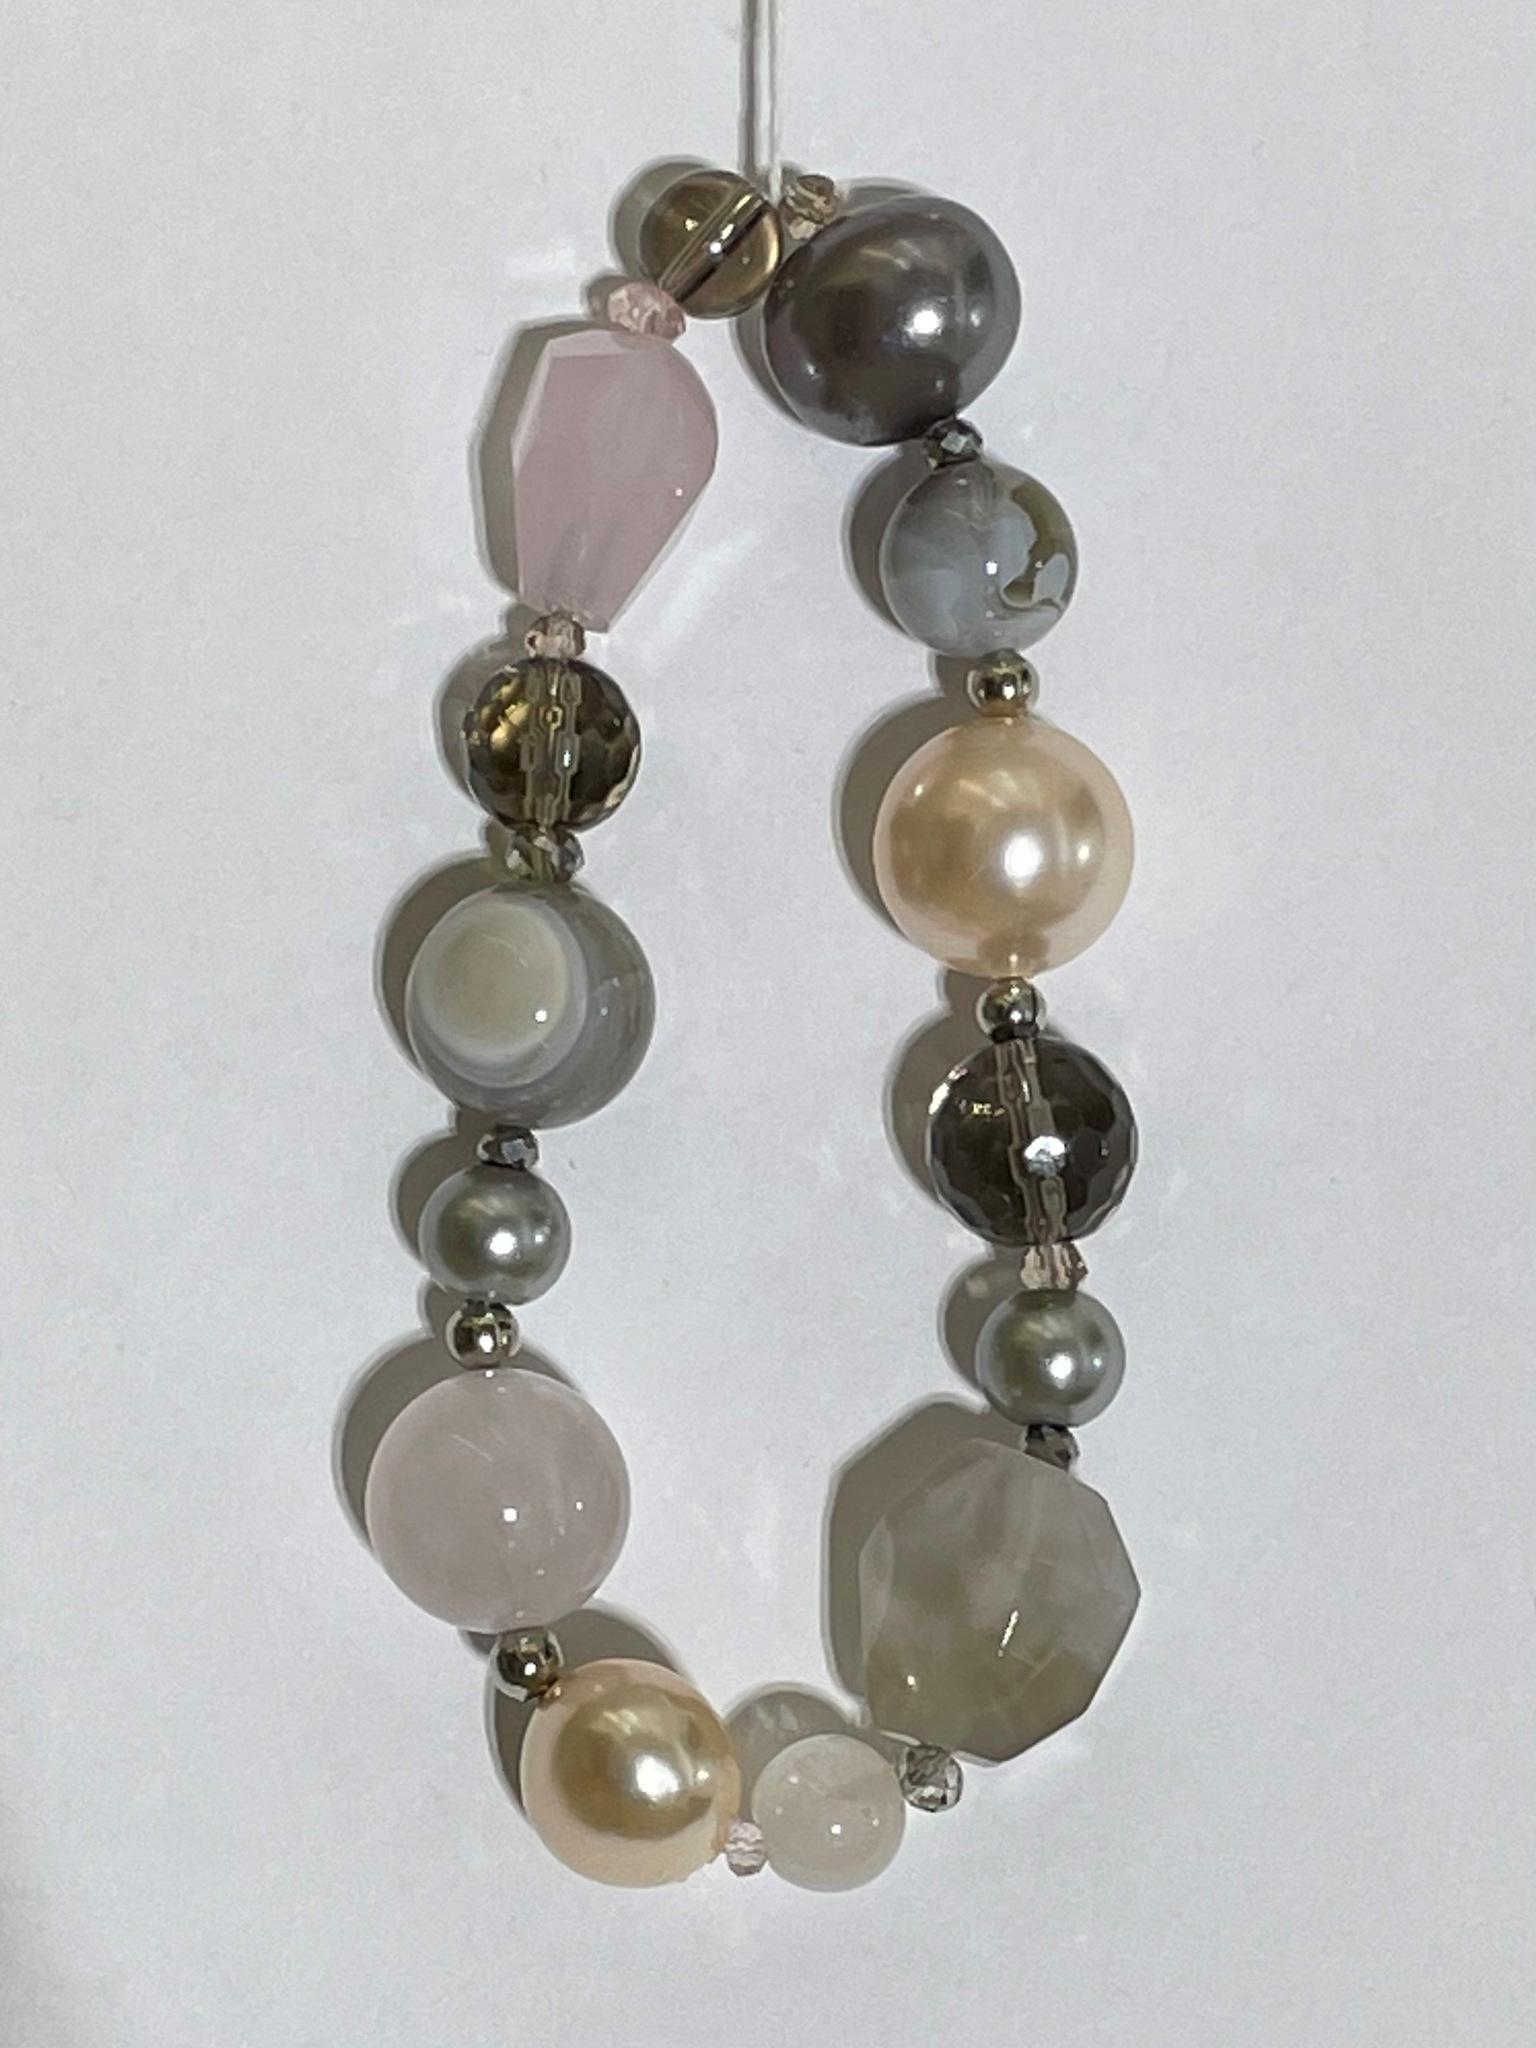 8006-агат (браслет из натуральных камней)